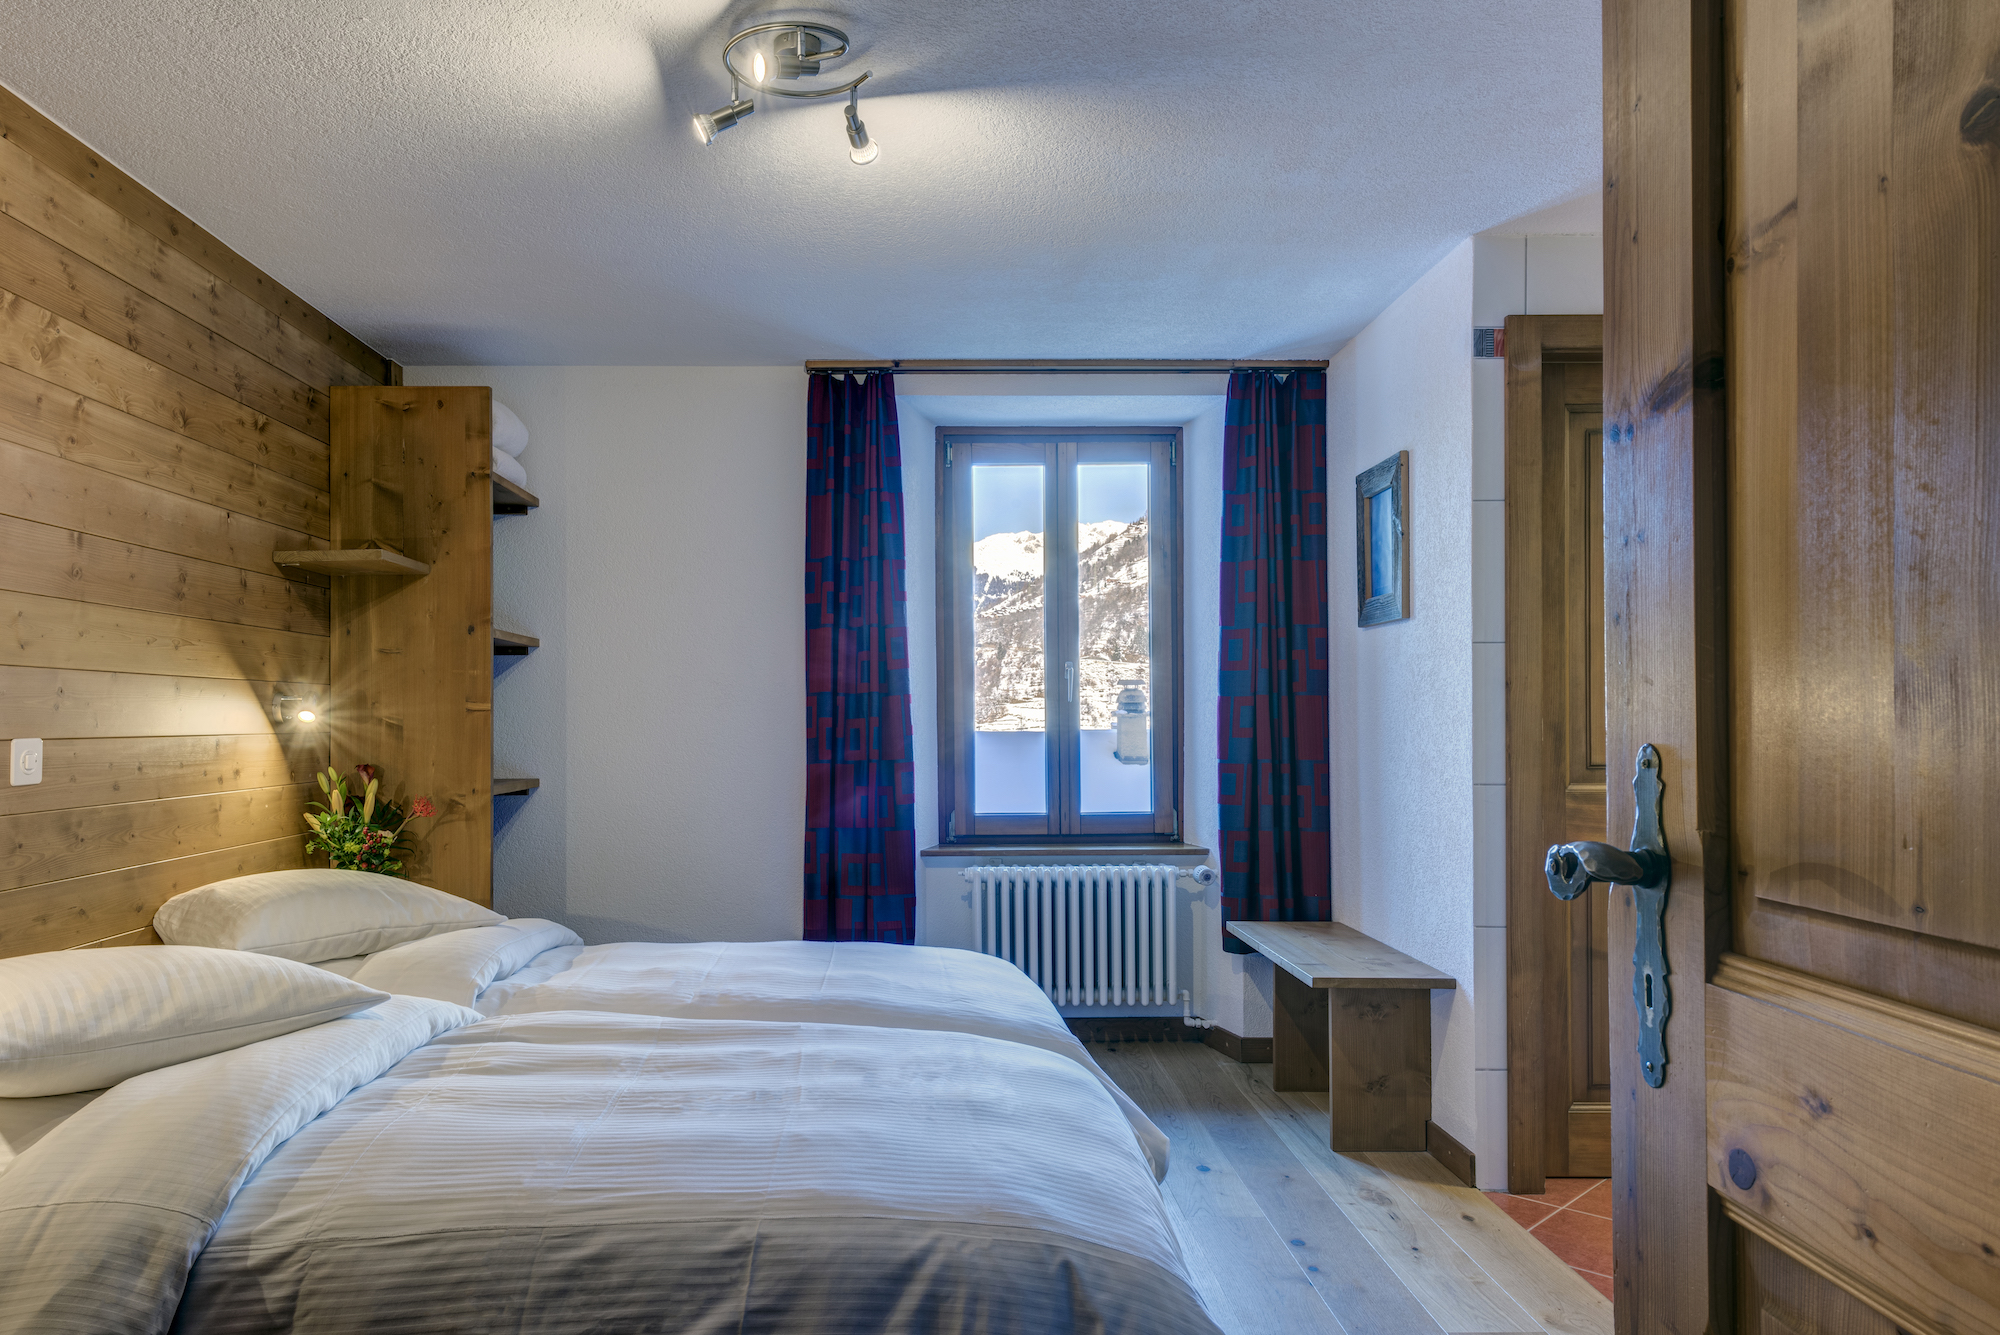 Hotel_La_Vallee-35.jpg